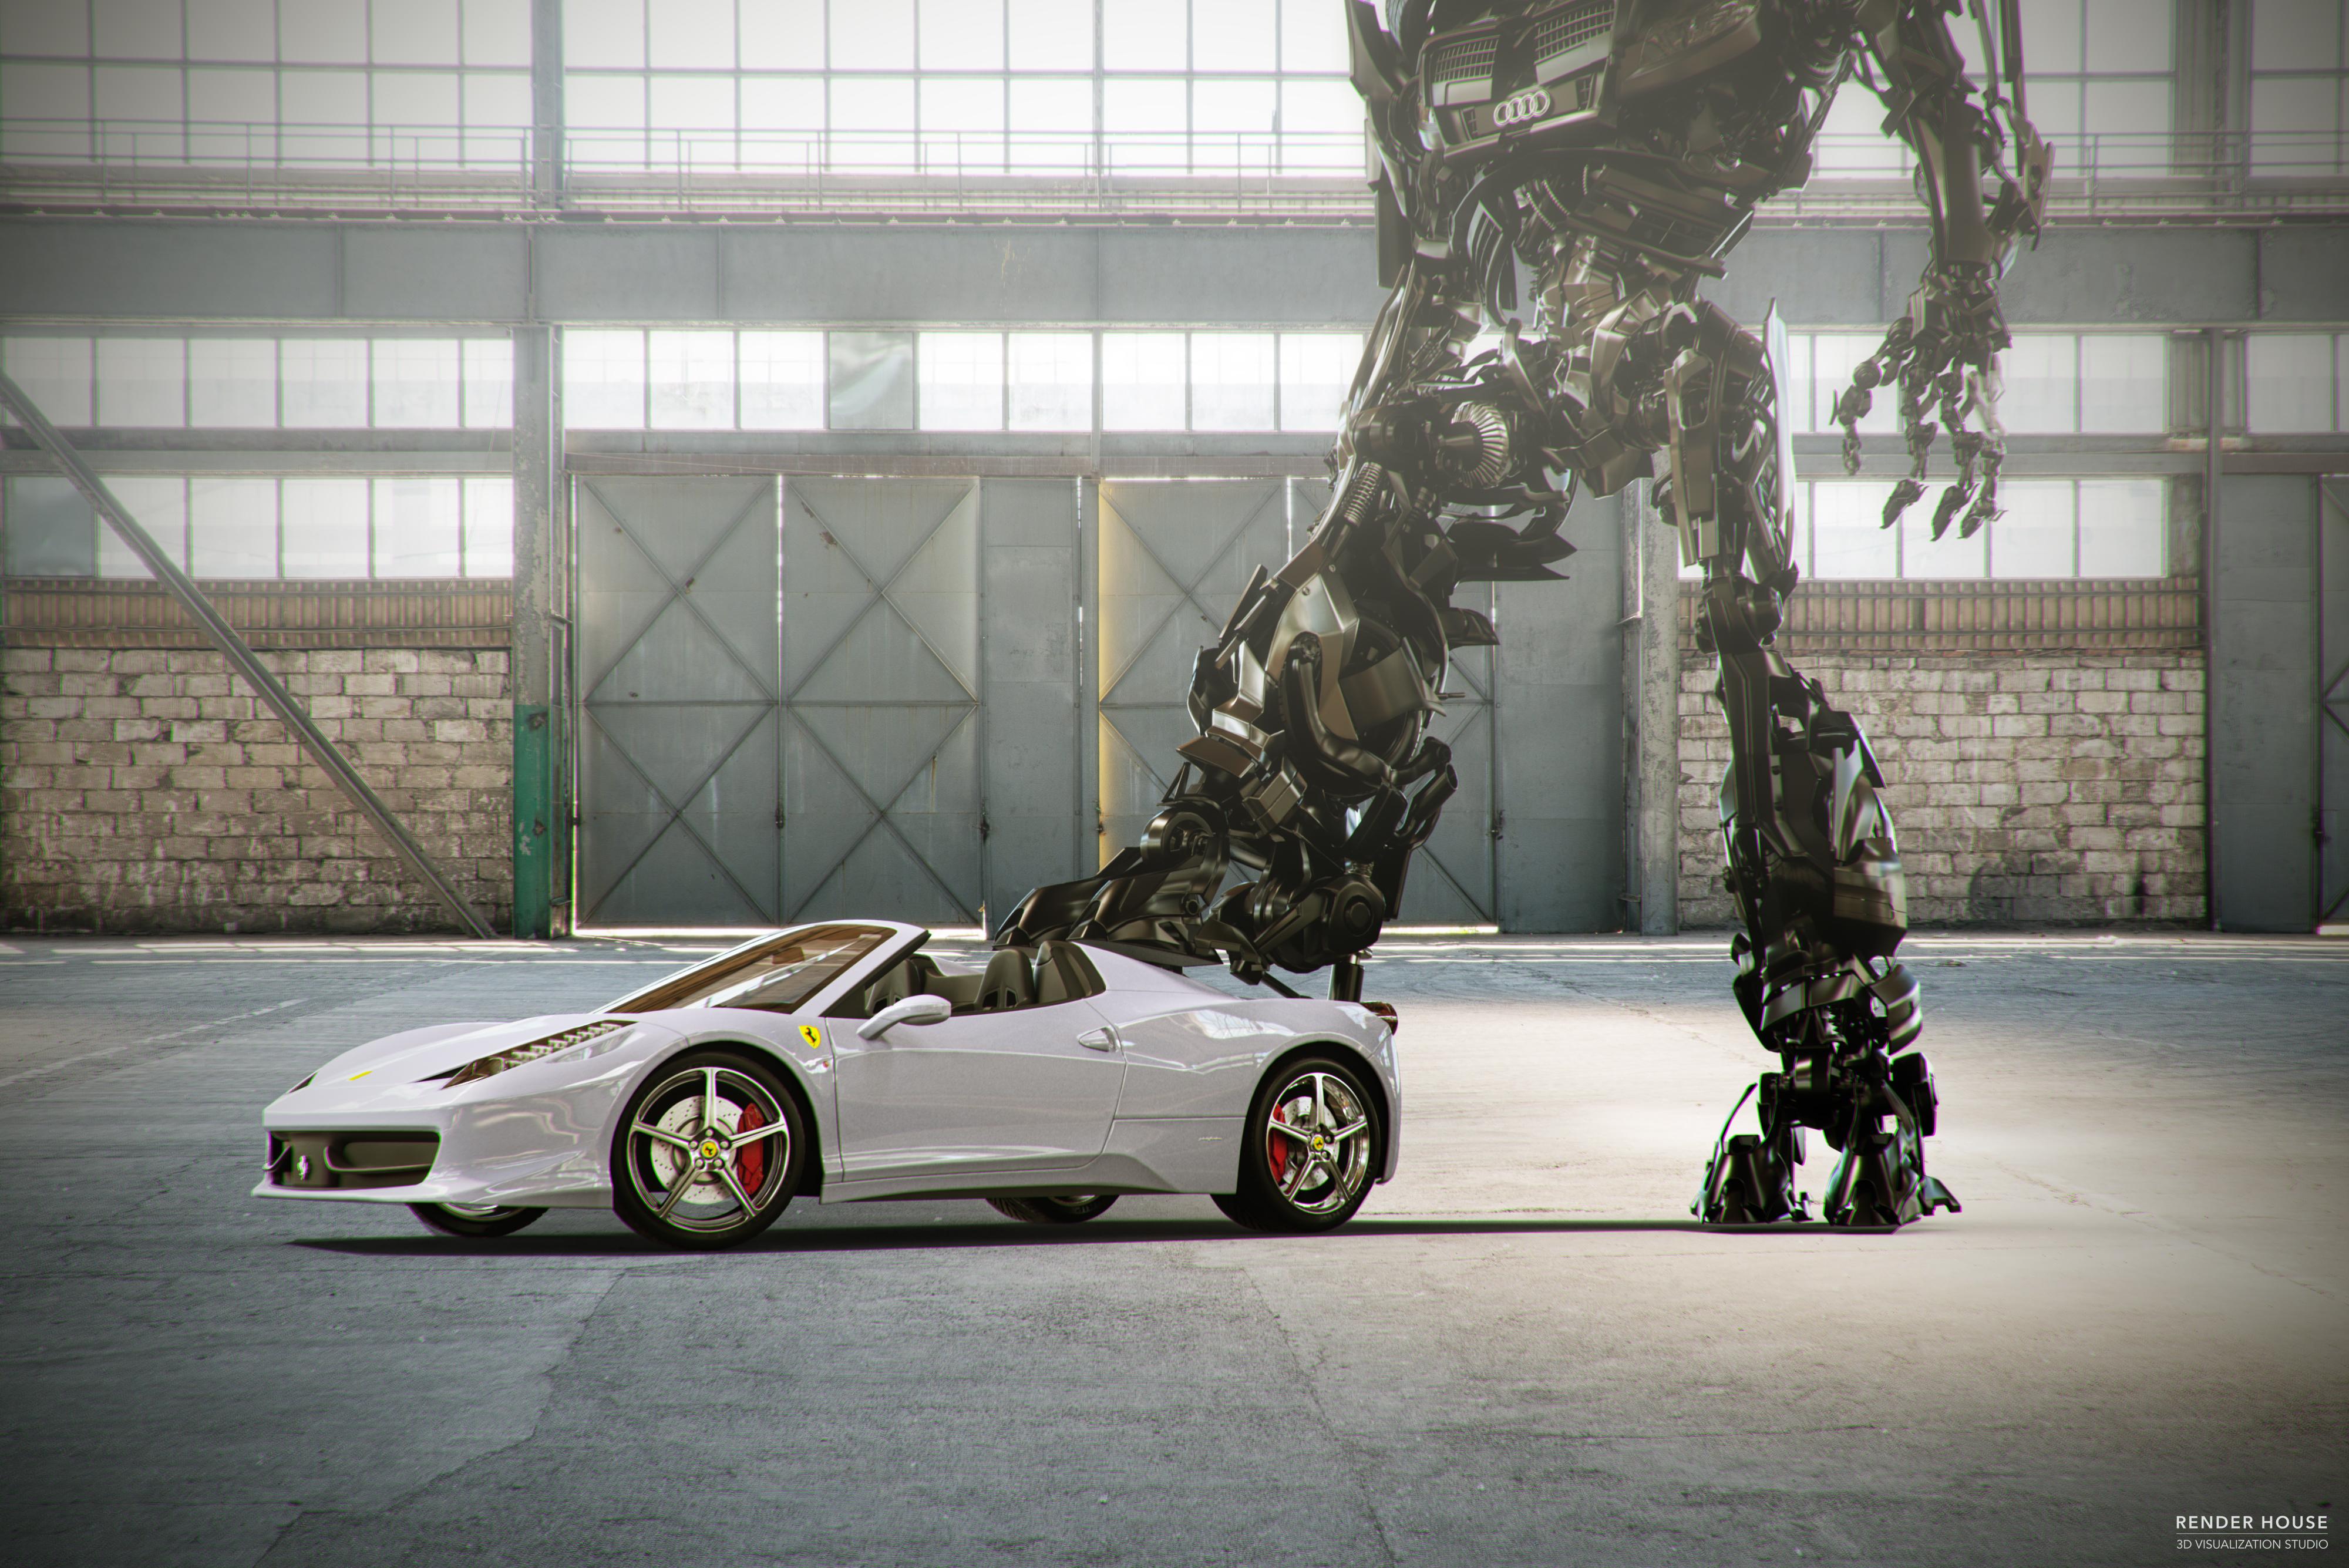 Ferrari and Transformers